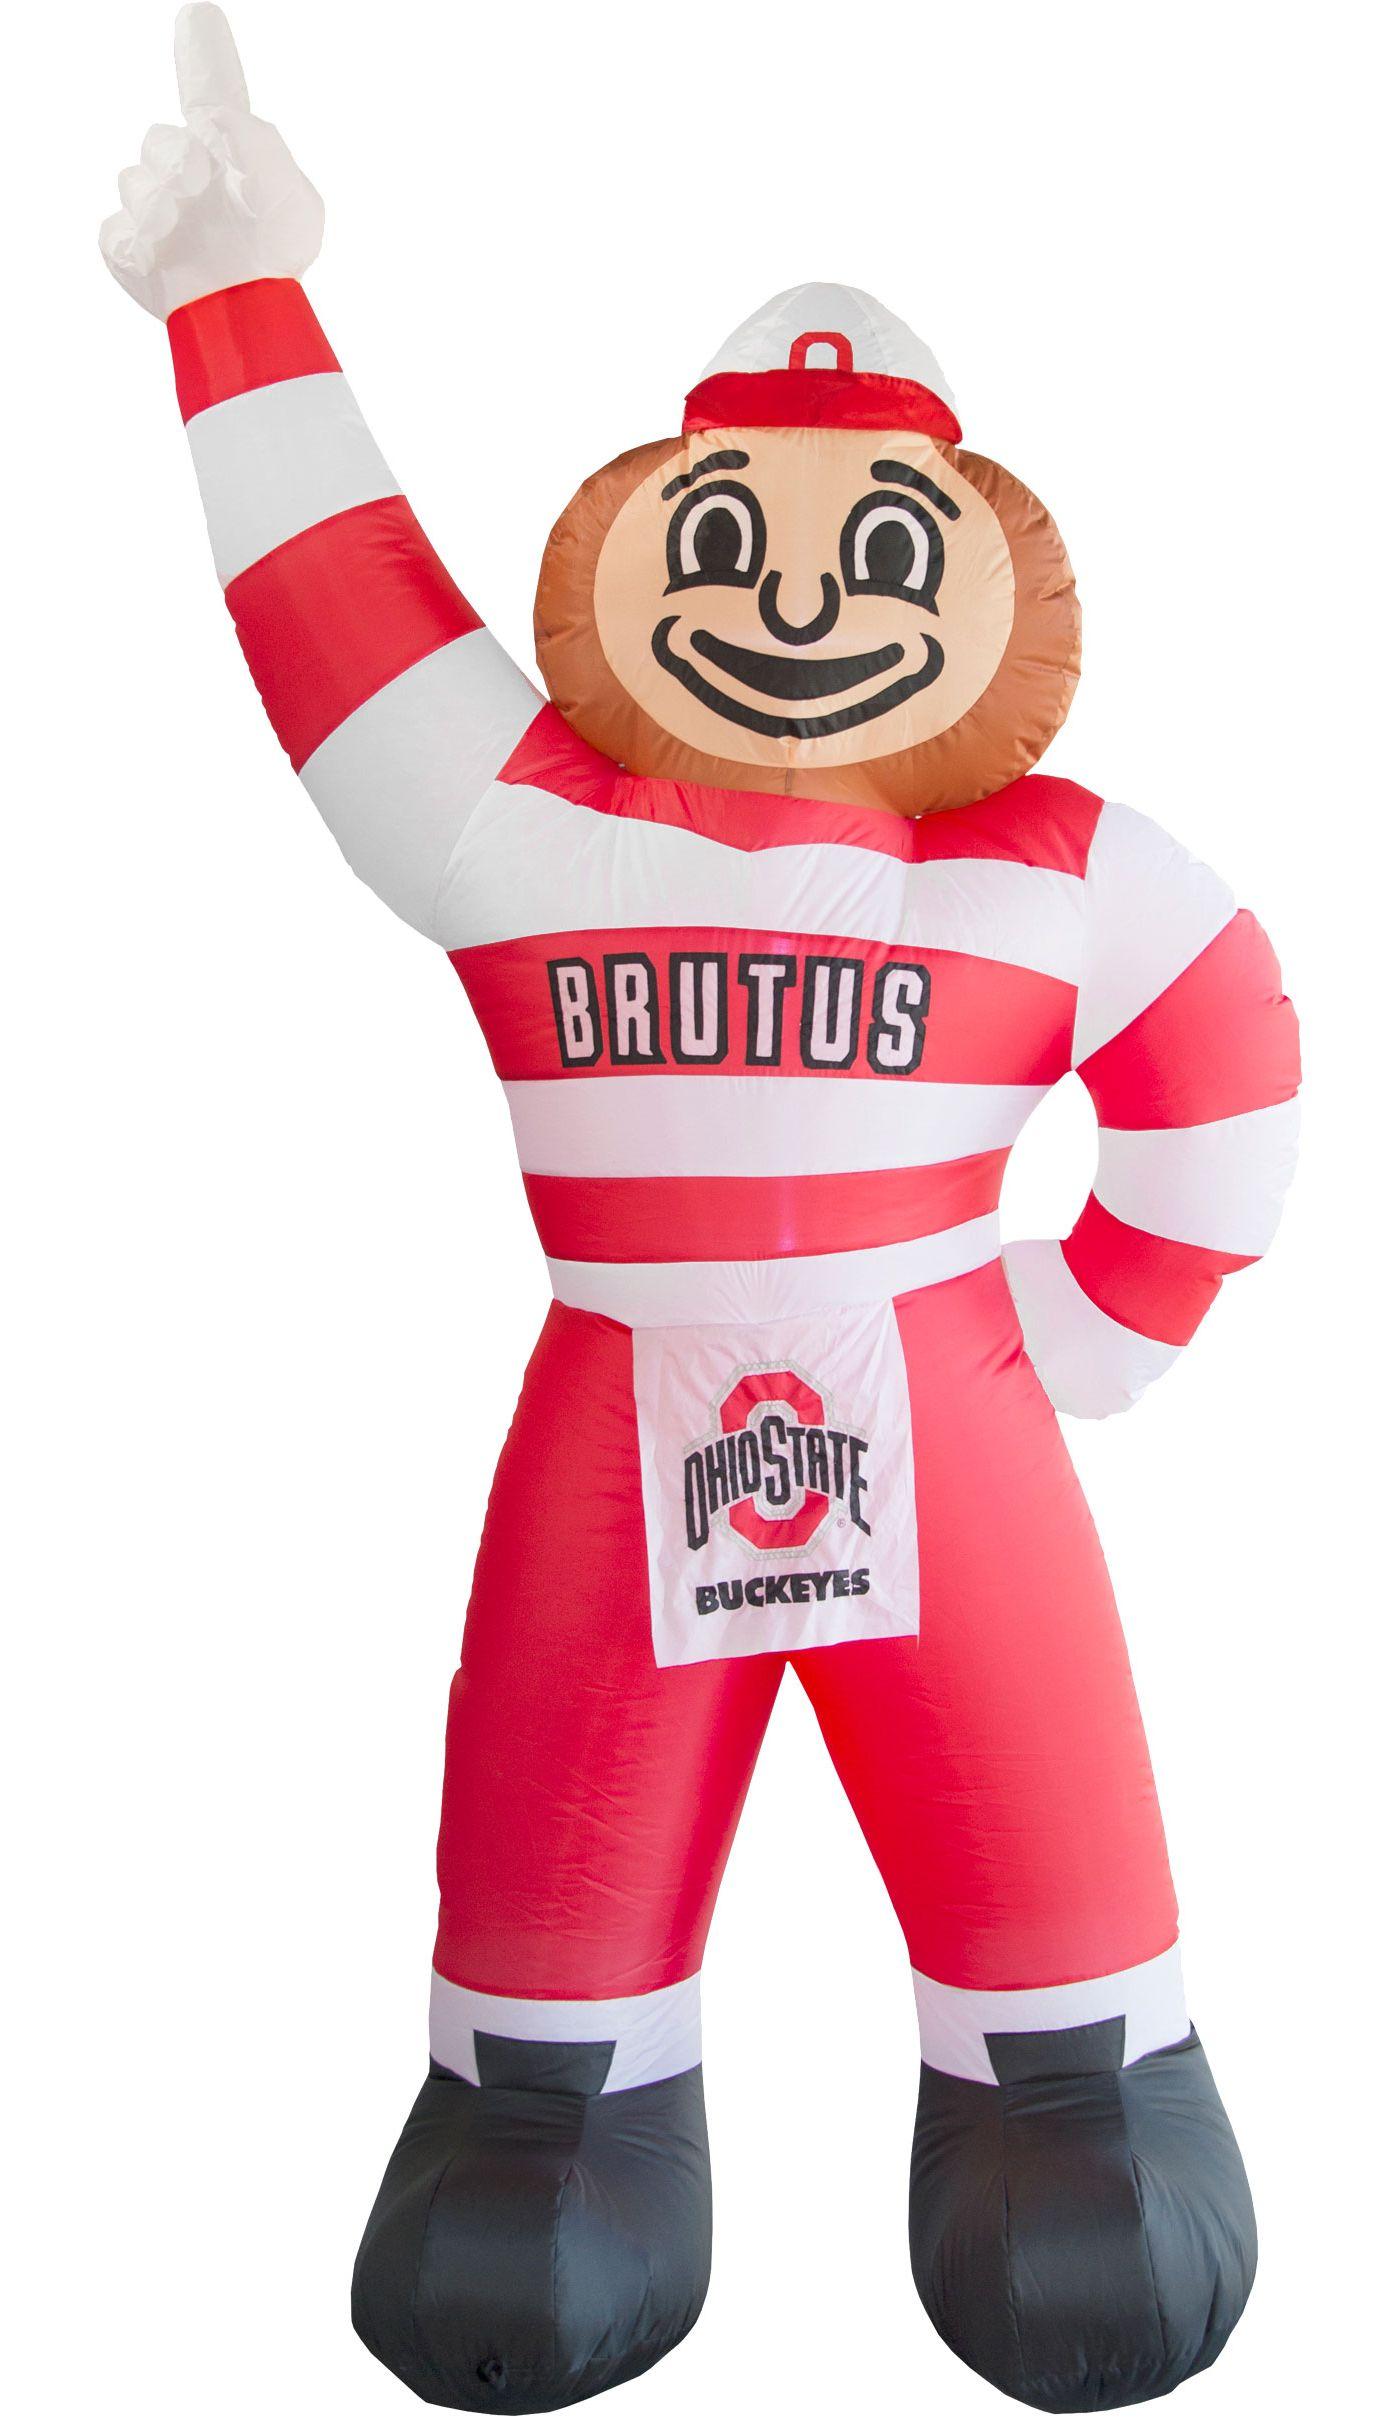 Boelter Ohio State Buckeyes 7' Inflatable Mascot